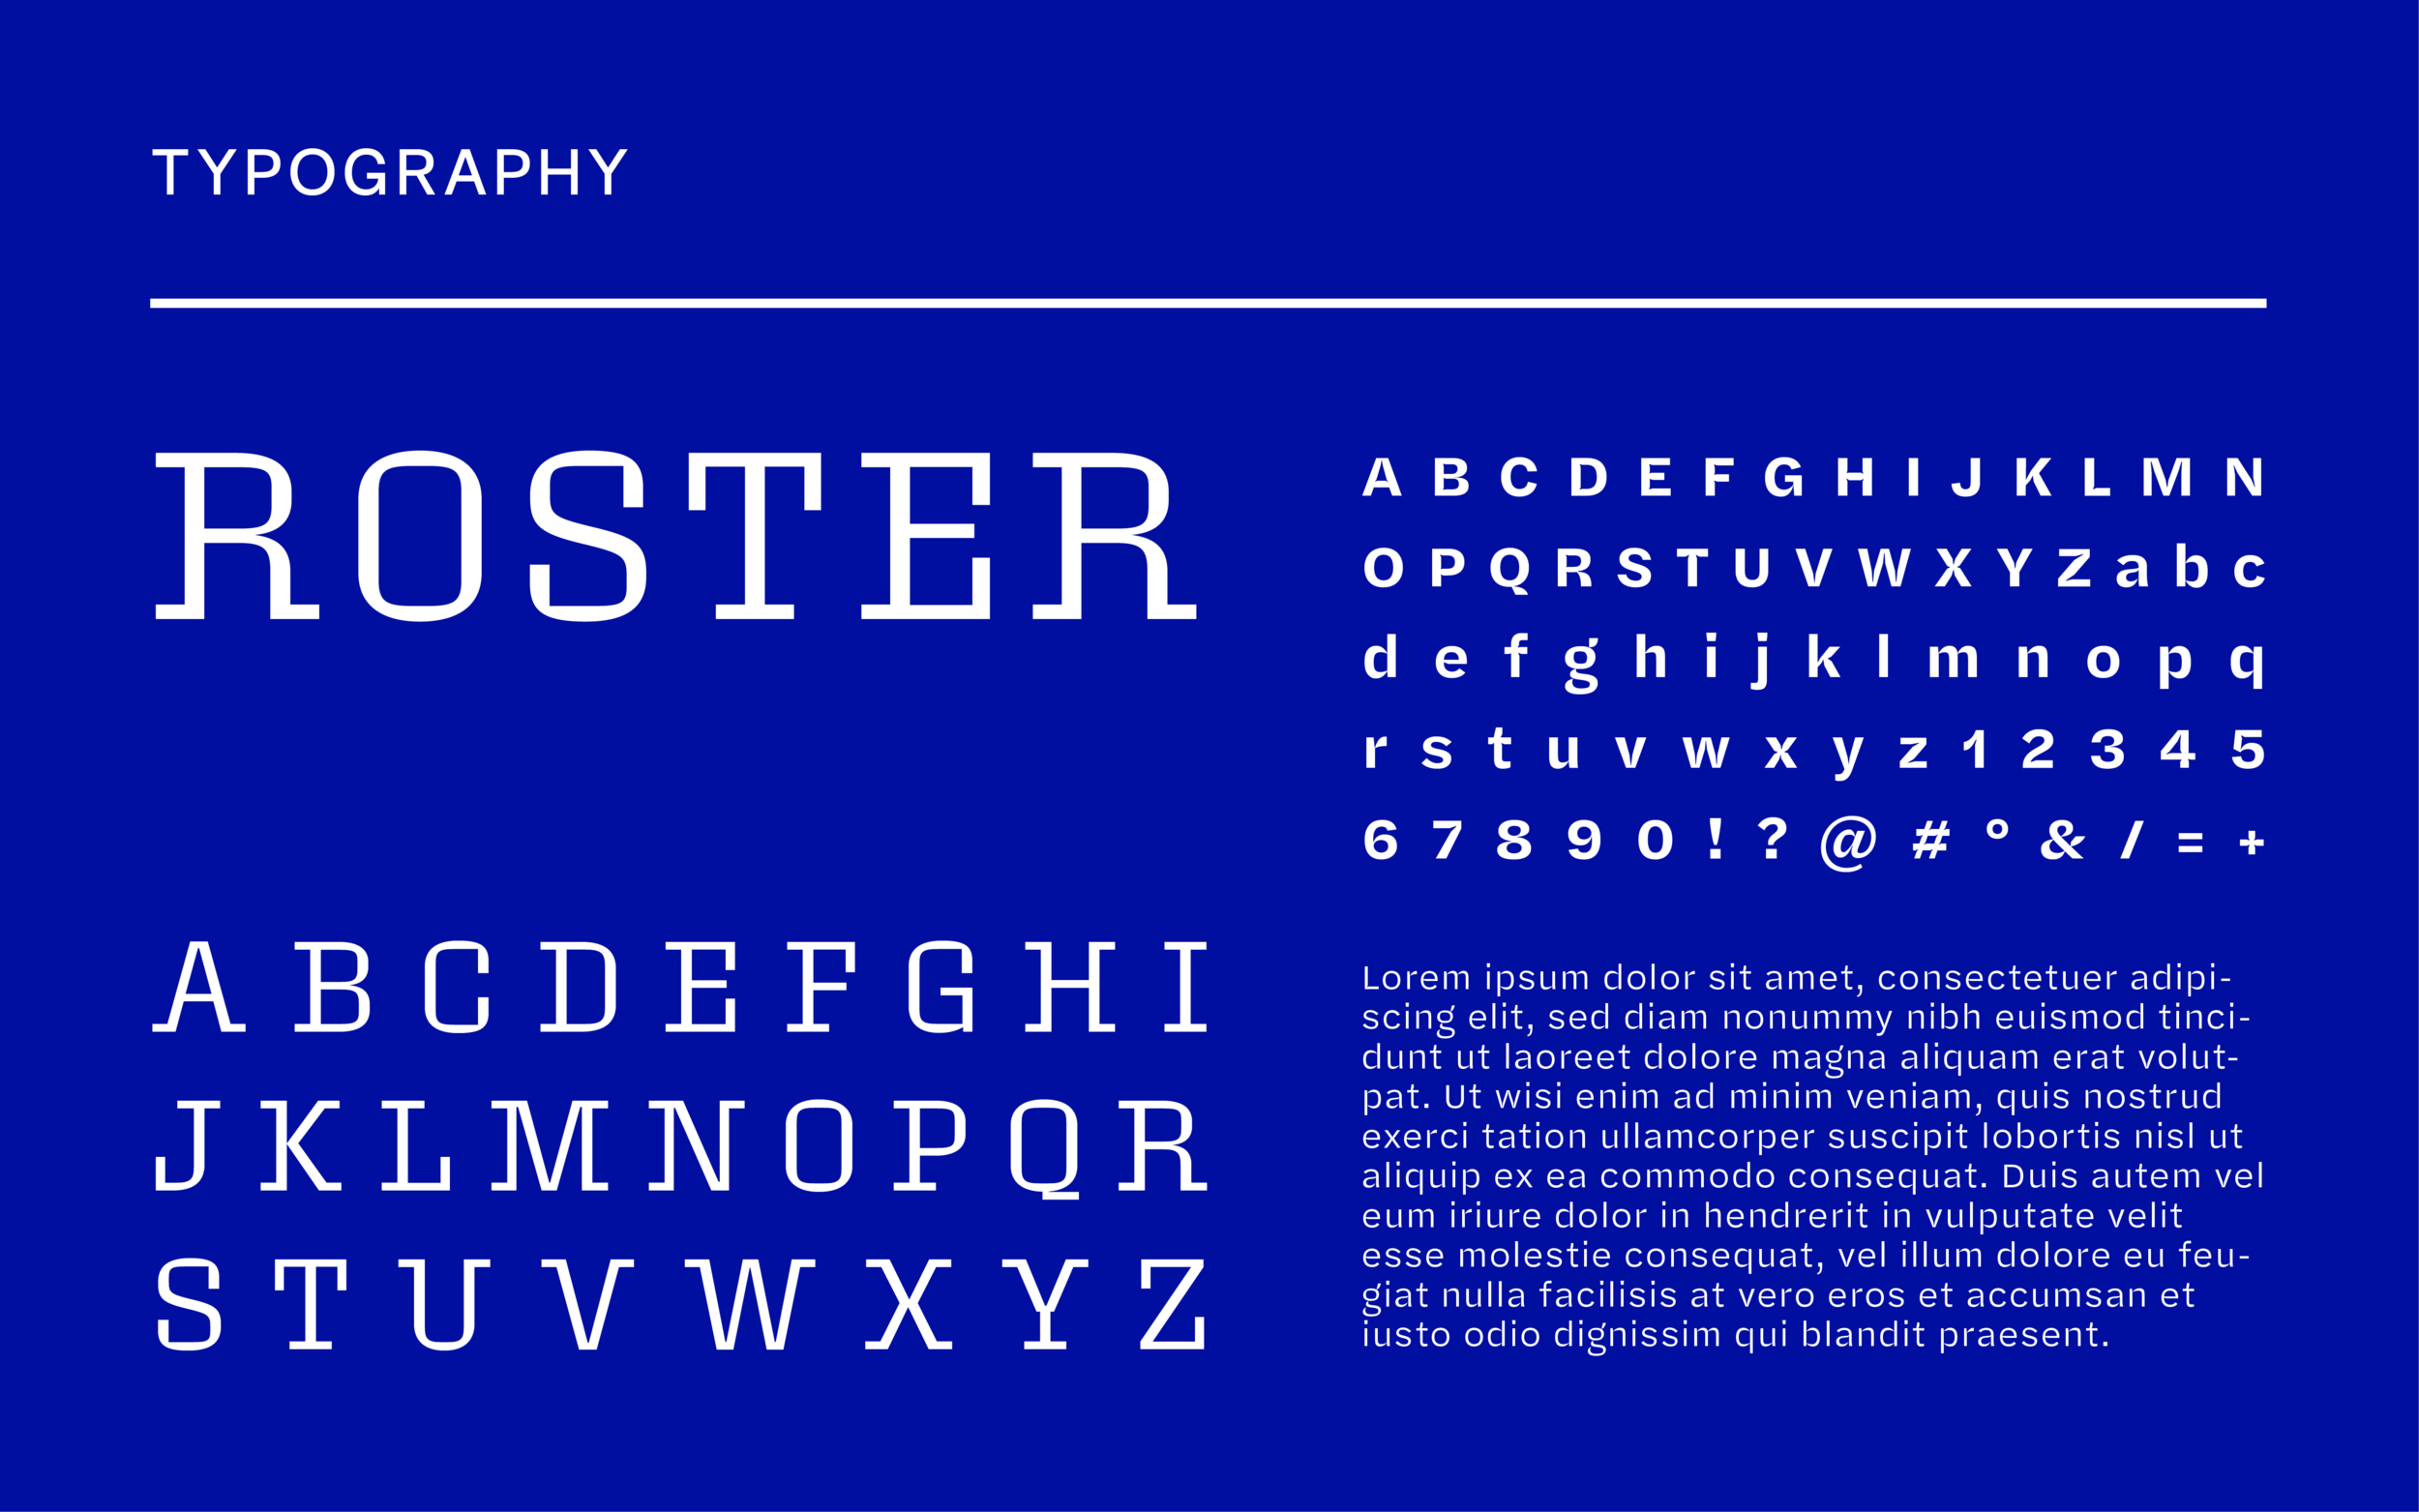 ixdd-typography-01.png